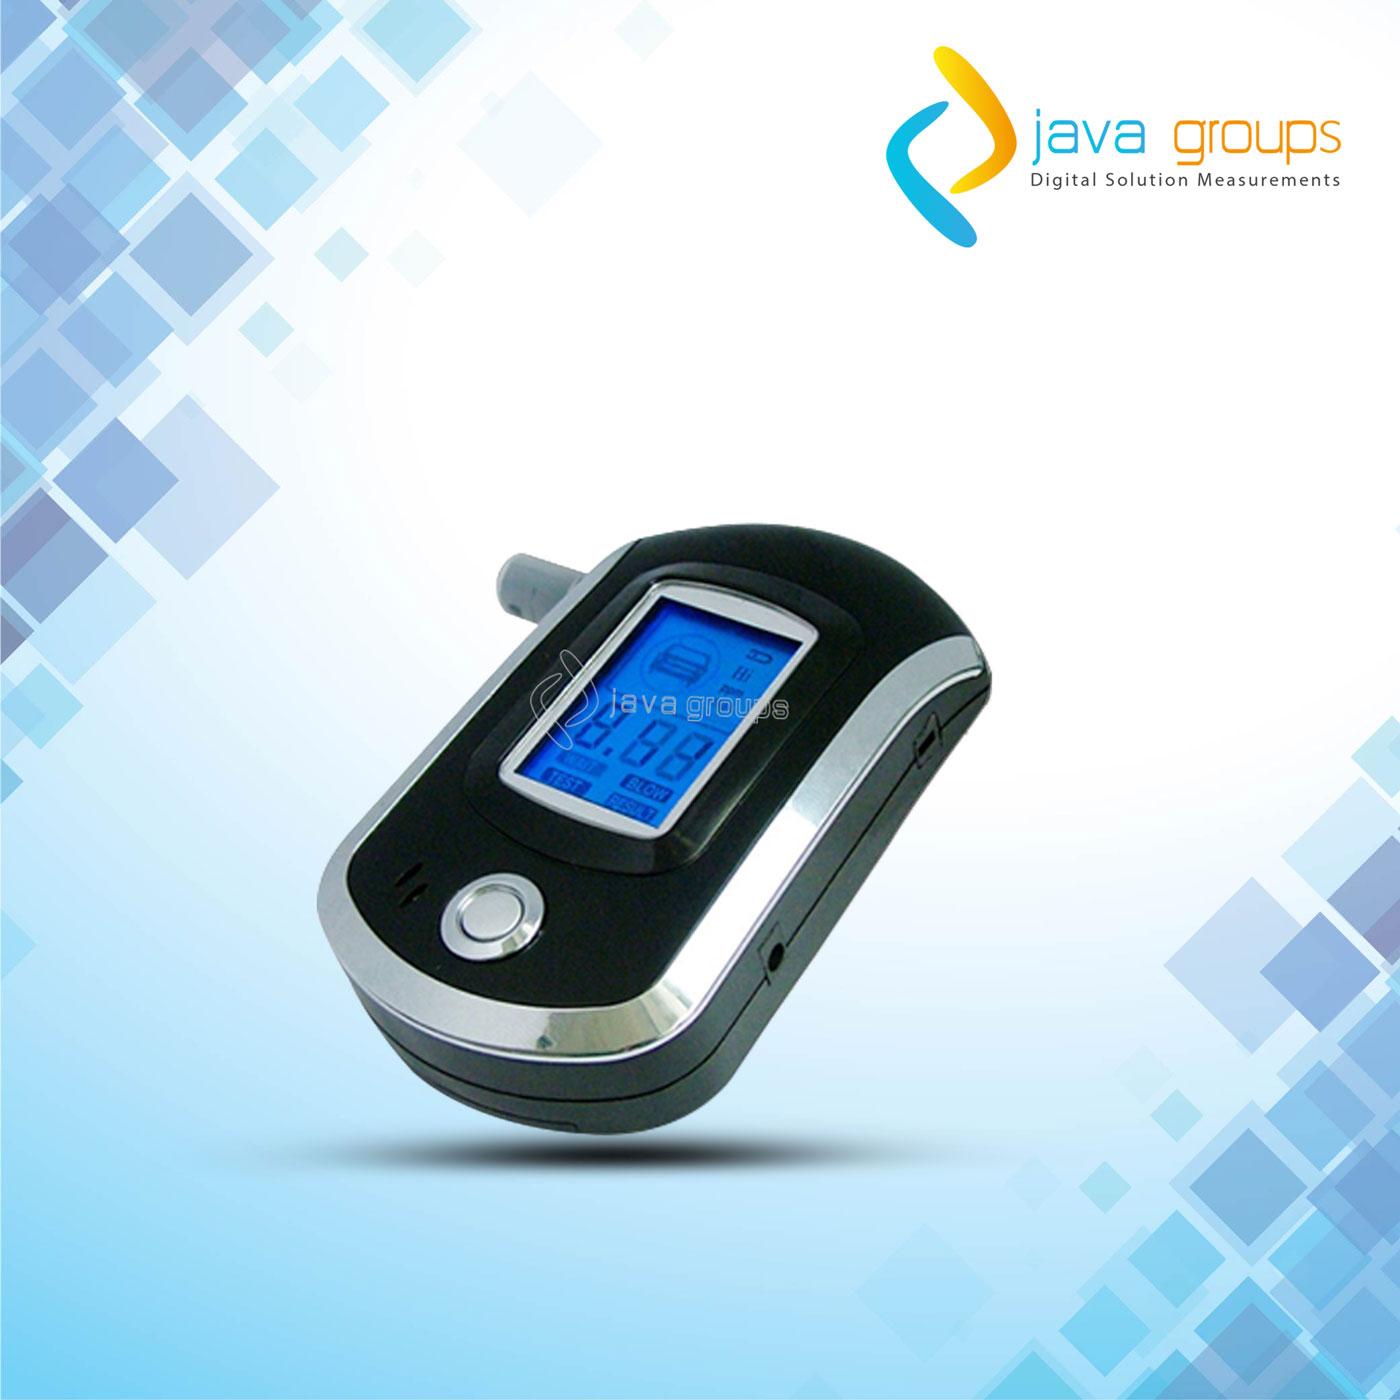 Alat Ukur Digital Kadar Alkohol Tester Seri AMT6000